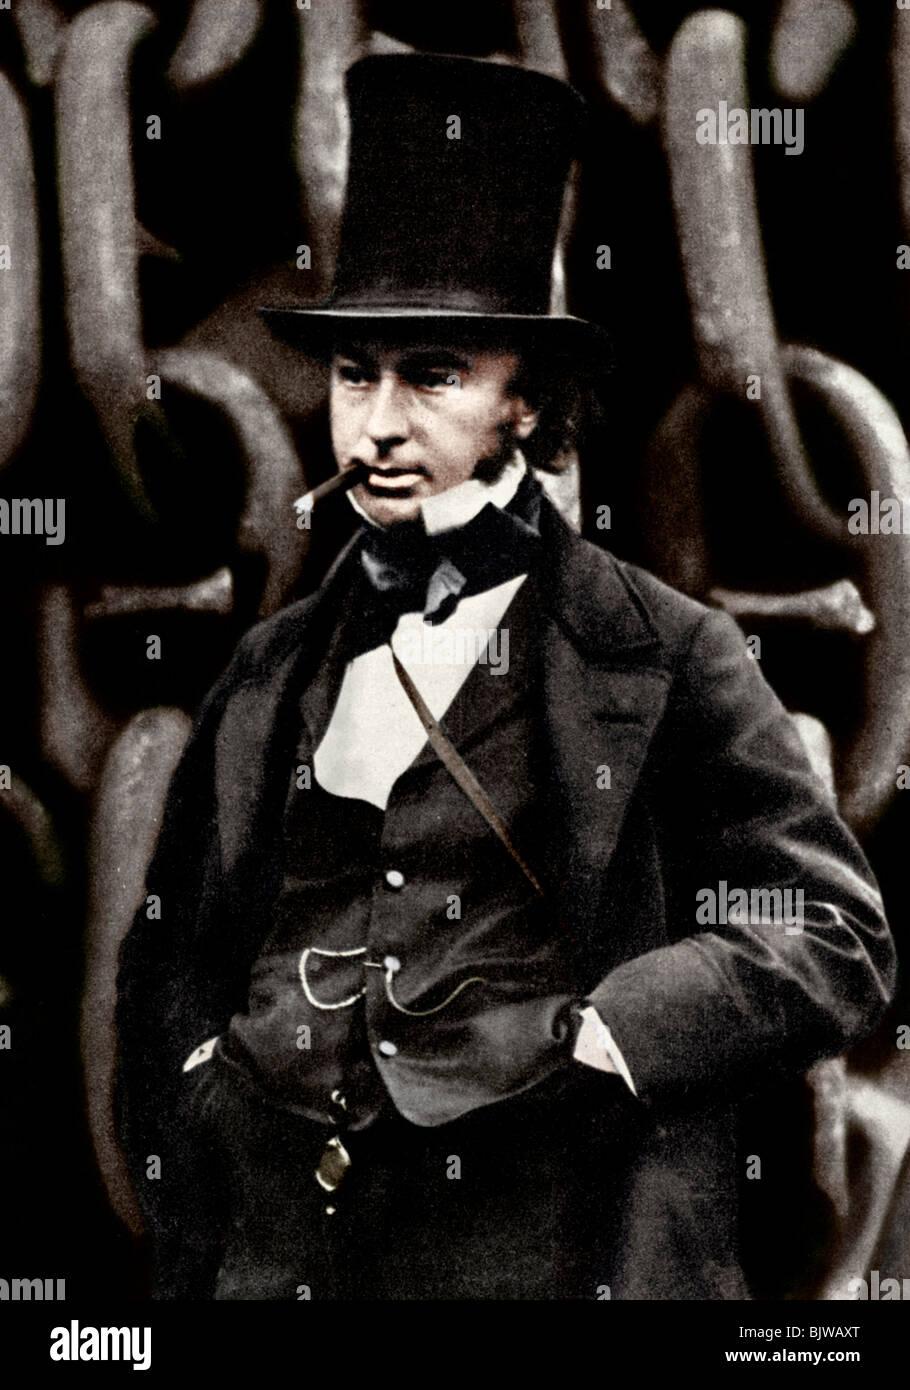 Isambard Kingdom Brunel, British engineer, 1857 (1956). - Stock Image